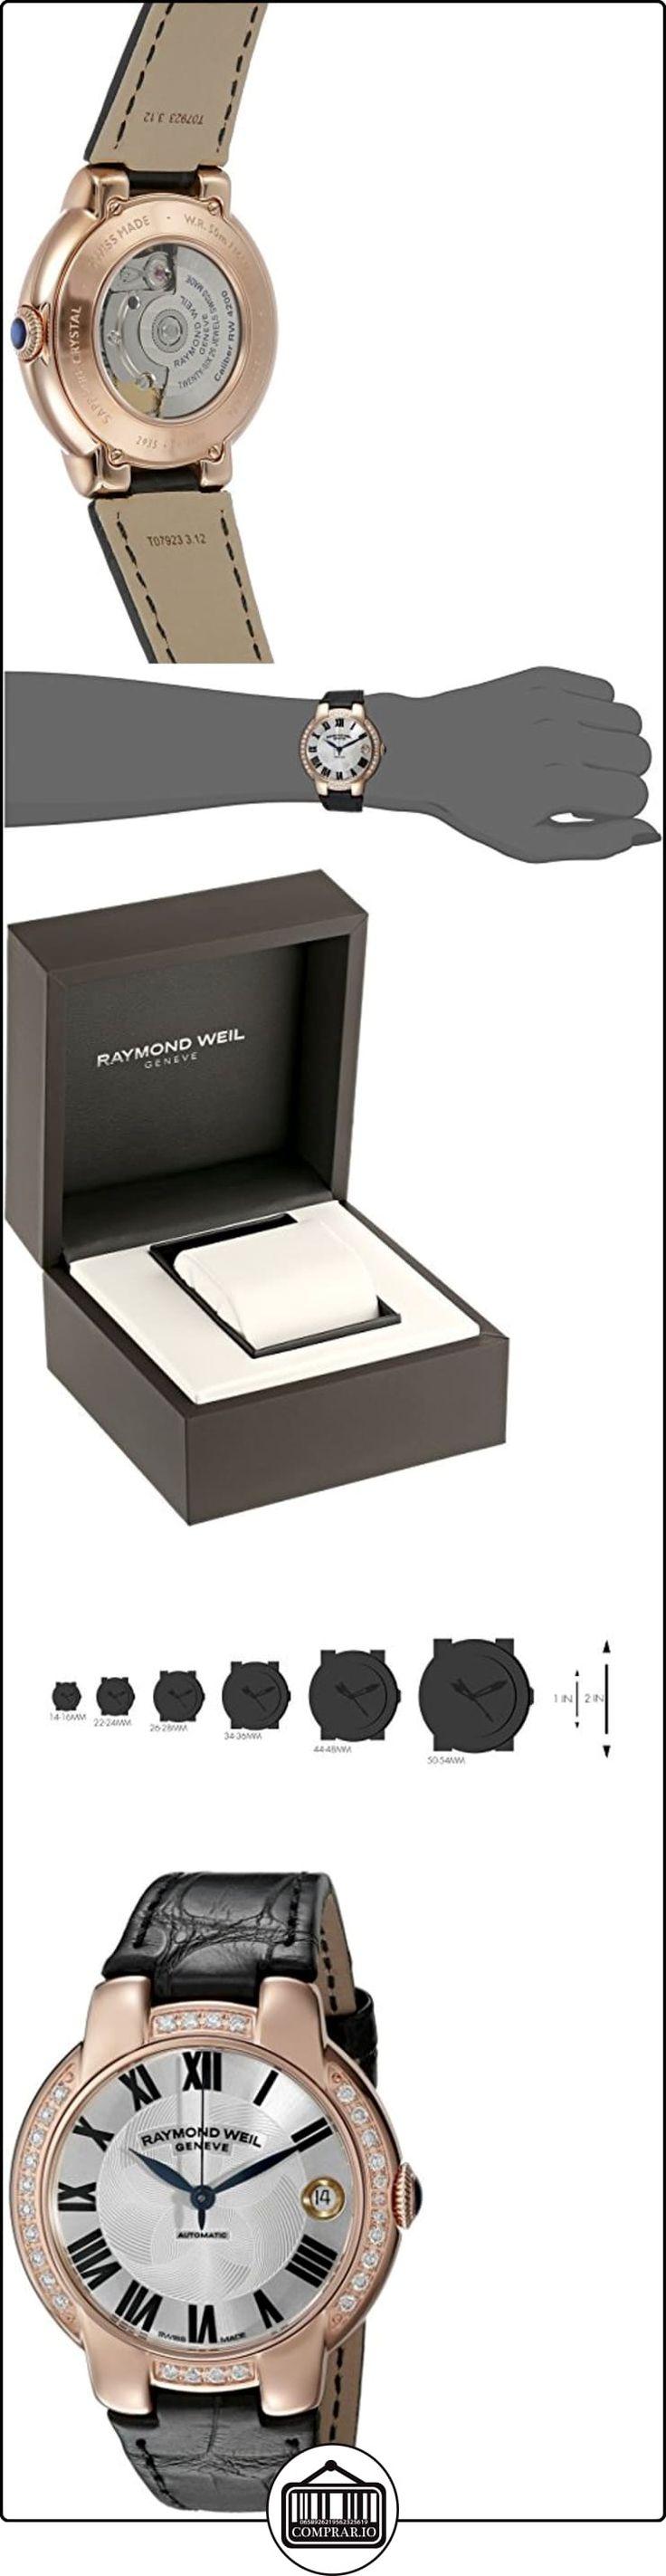 Raymond Weil Jasmine Automatic Rose Gold Steel & Diamond Womens Watch Date 2935-PCS-01659  ✿ Relojes para mujer - (Lujo) ✿